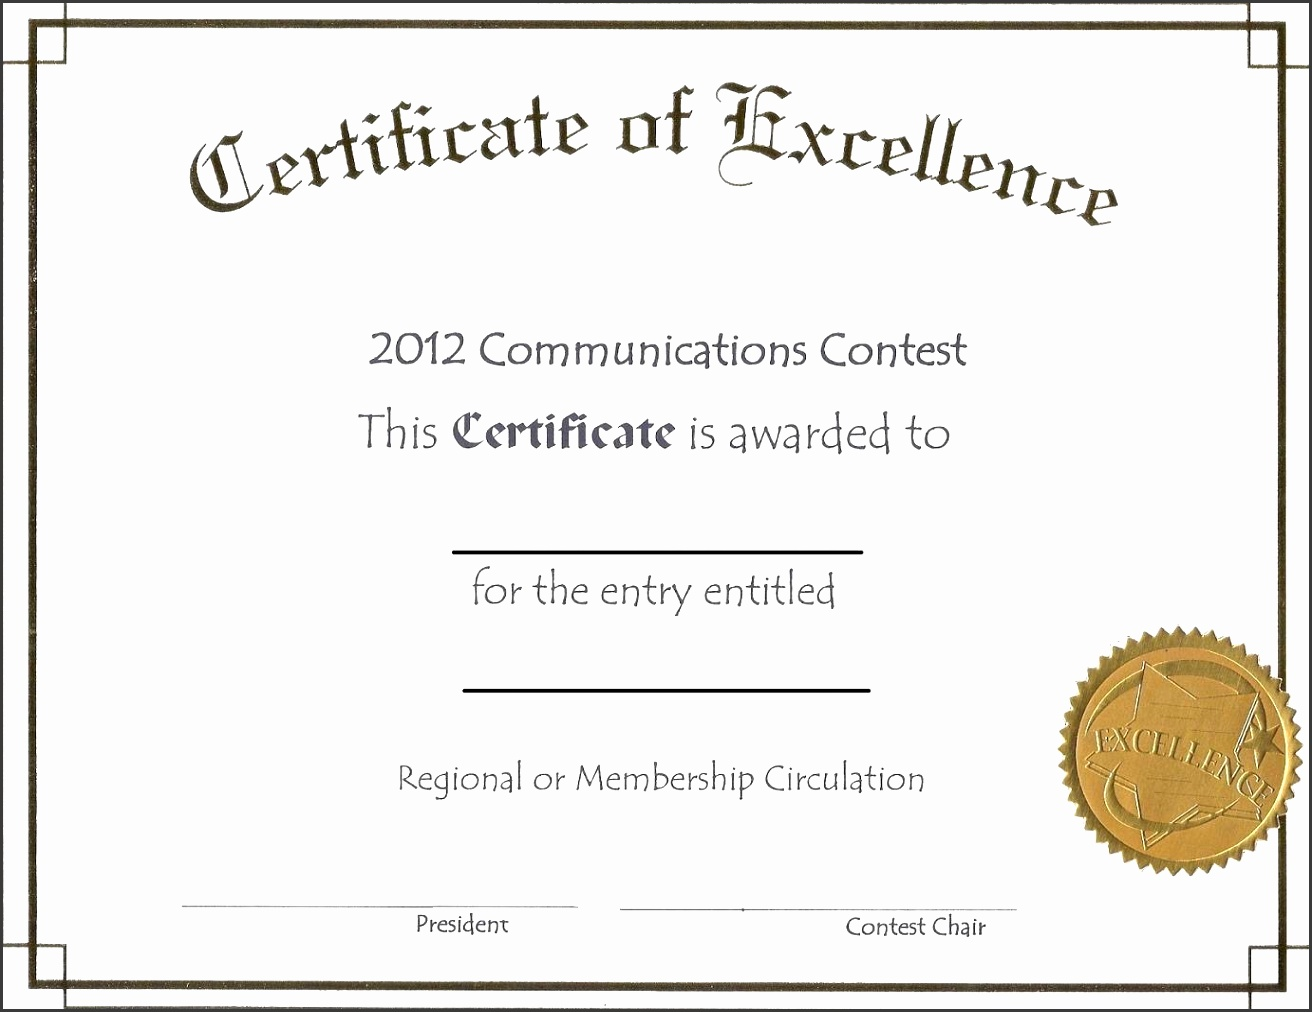 Winner certificate template free gallery templates example free word award template printable rental agreement lease winner